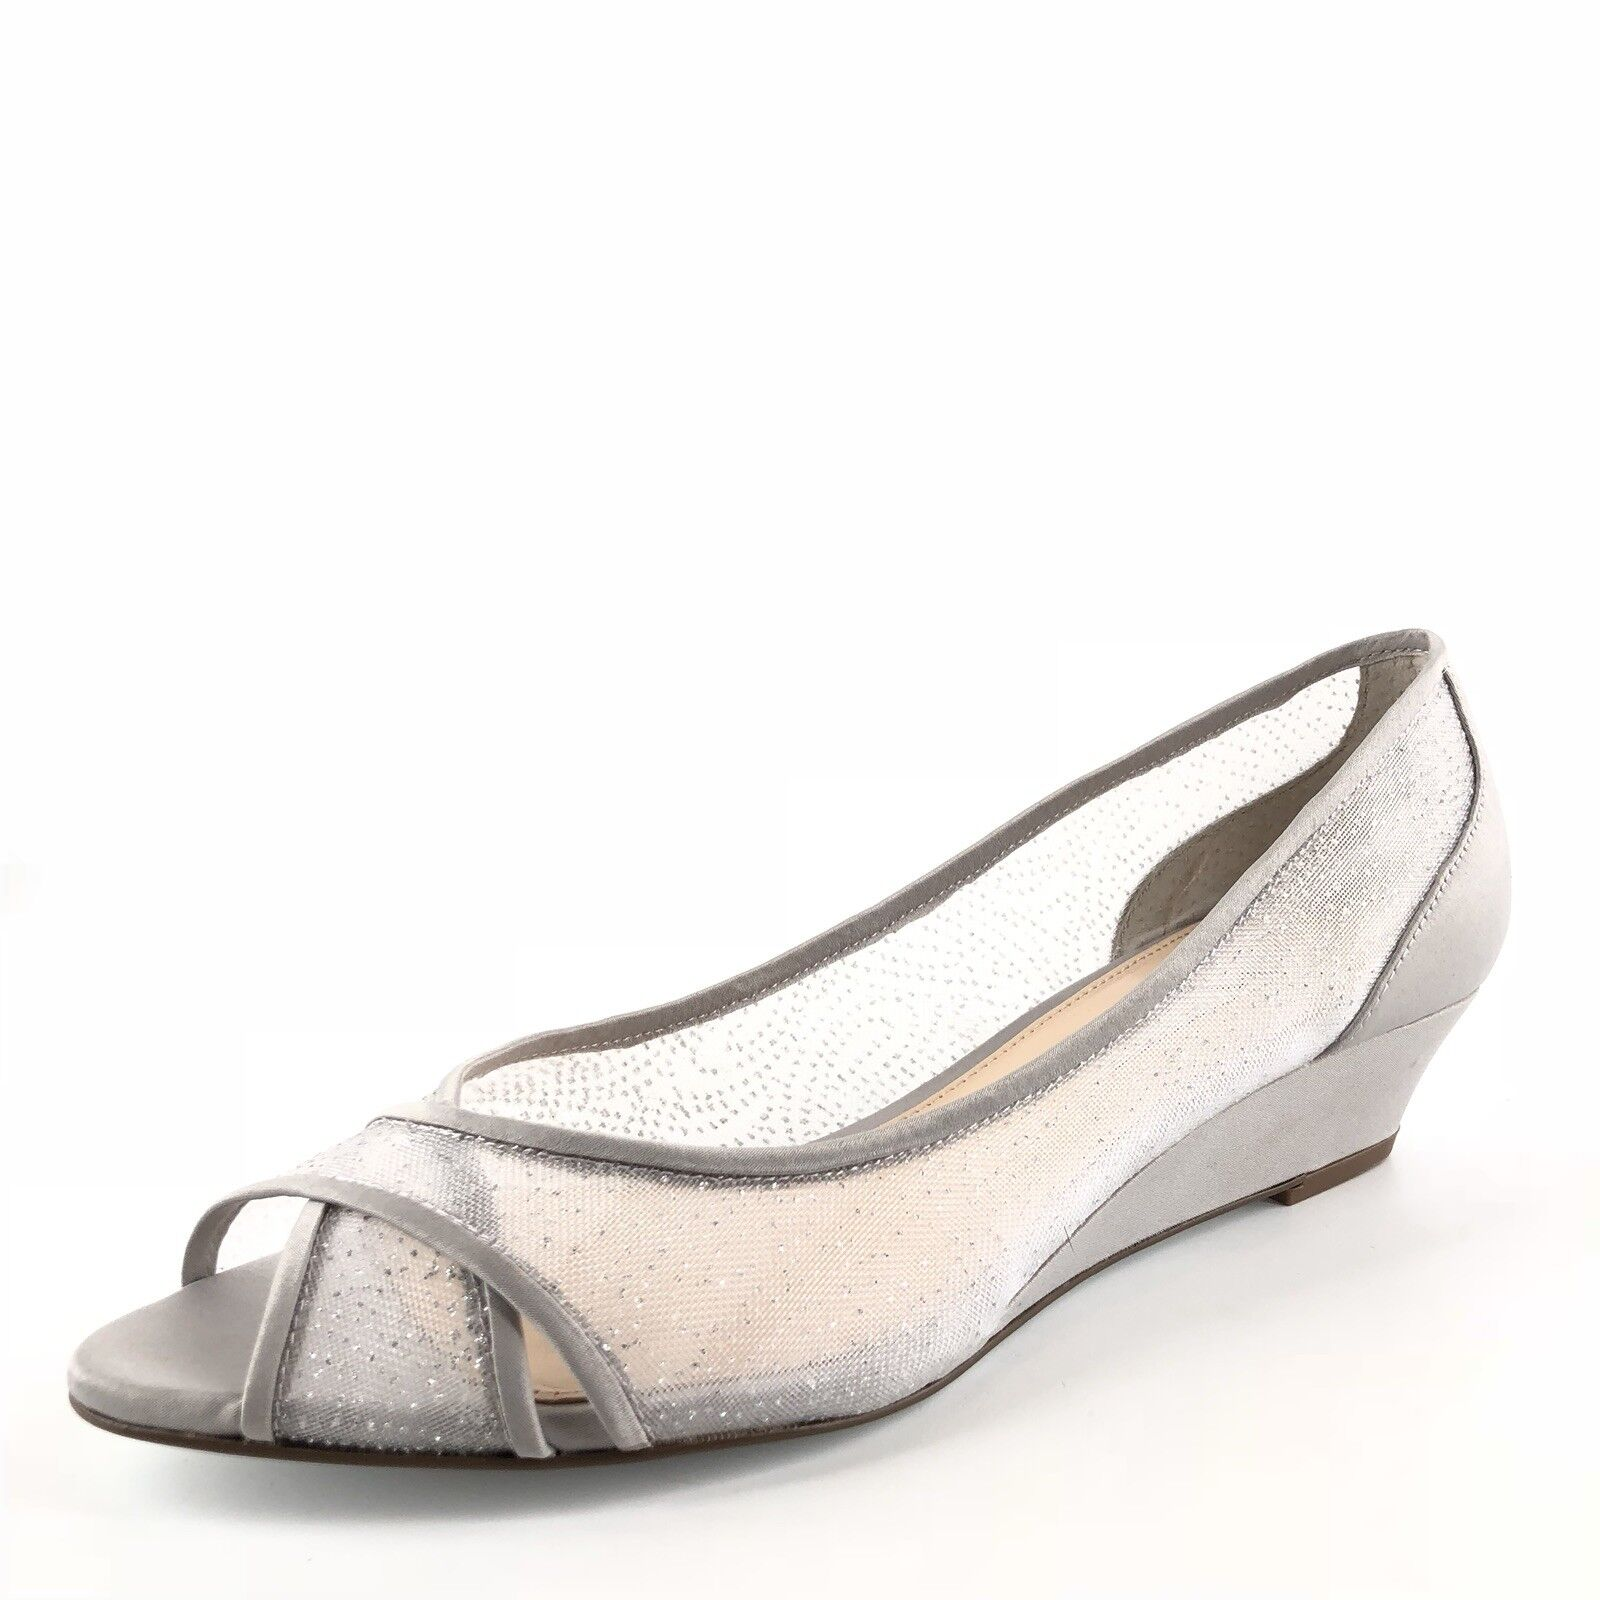 Nina Women's Rigby Silver Satin Slip On Wedge Pumps Open Toe  Size 8.5 M